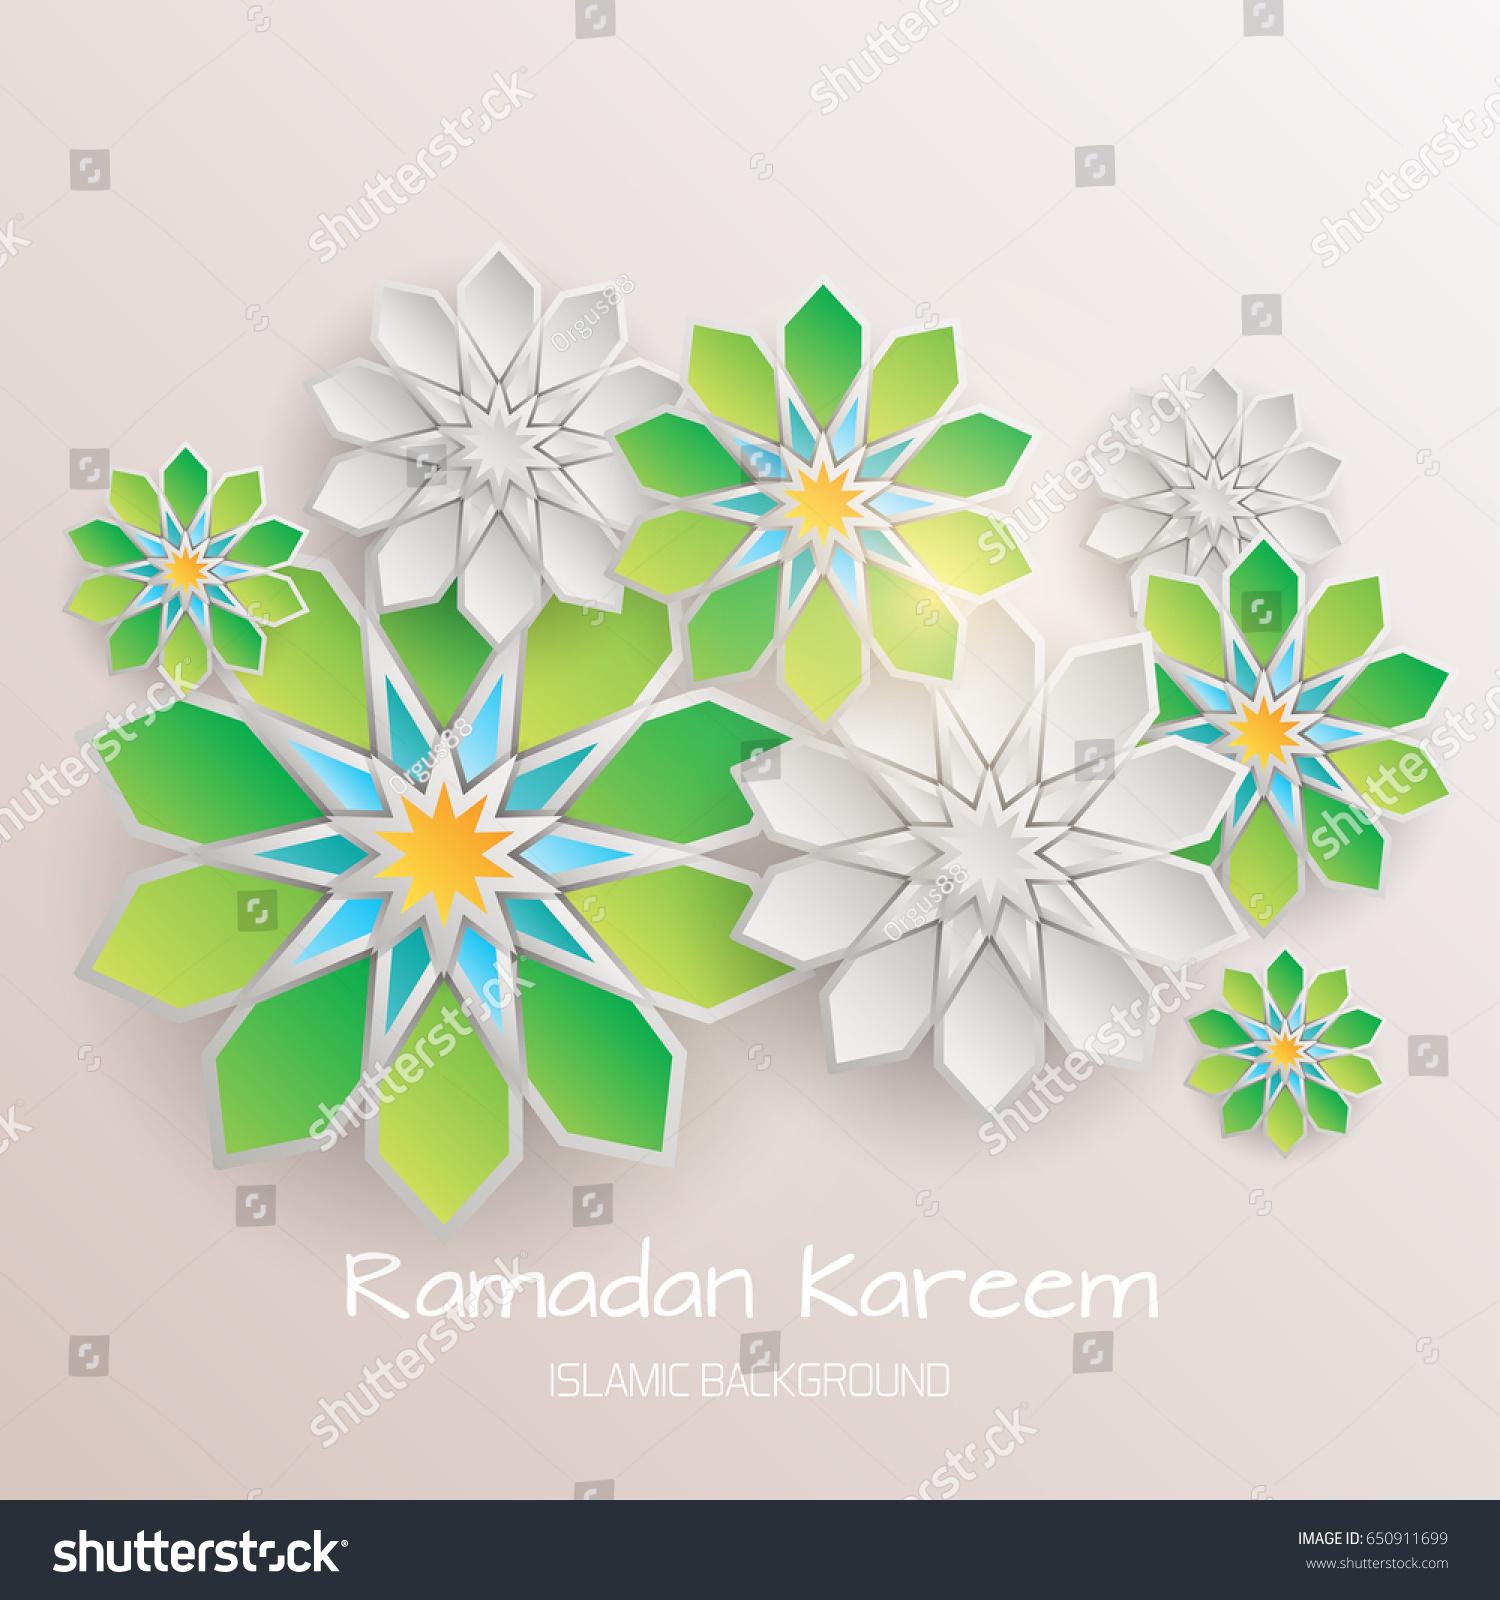 Greeting card paper graphic islamic geometric stock vector 650911699 greeting card with with paper graphic of islamic geometric art kristyandbryce Image collections